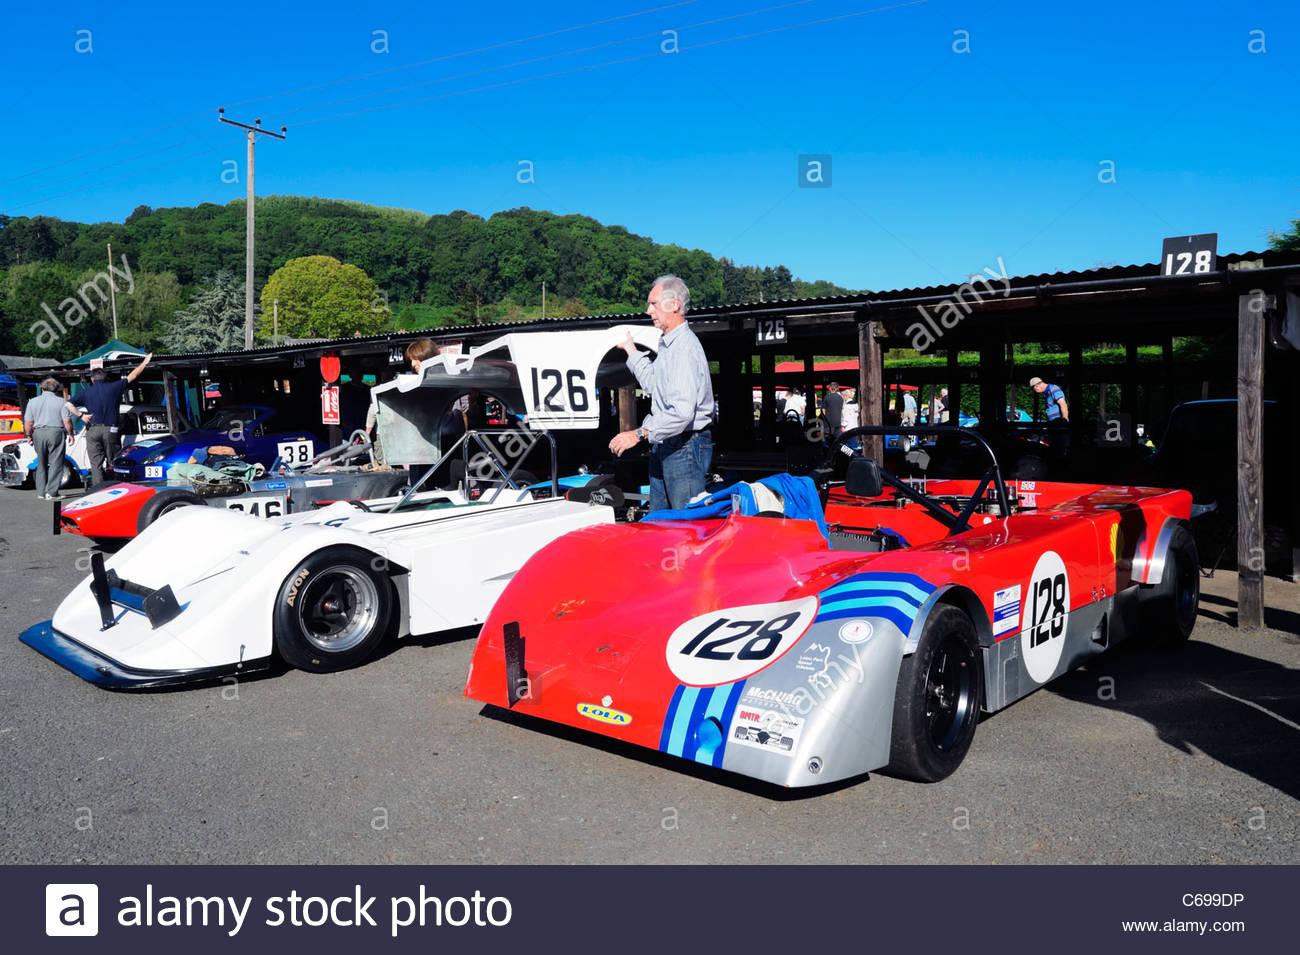 A Lola Car Stock Photos & A Lola Car Stock Images - Alamy